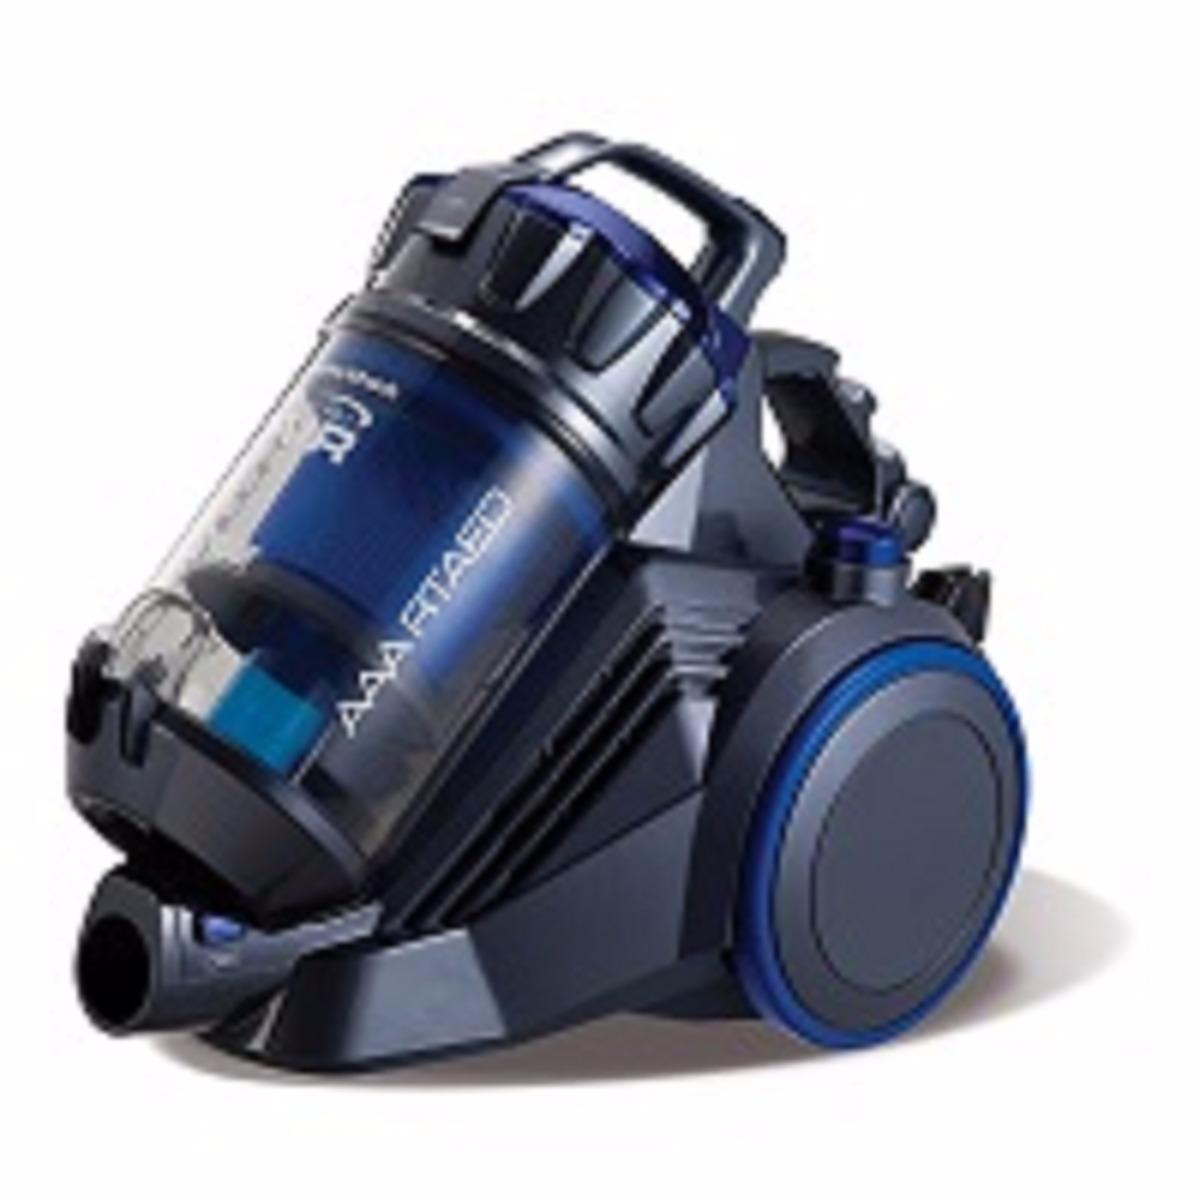 Morphy Richards 980520 750 Watts Bagless Vacuum Cleaner